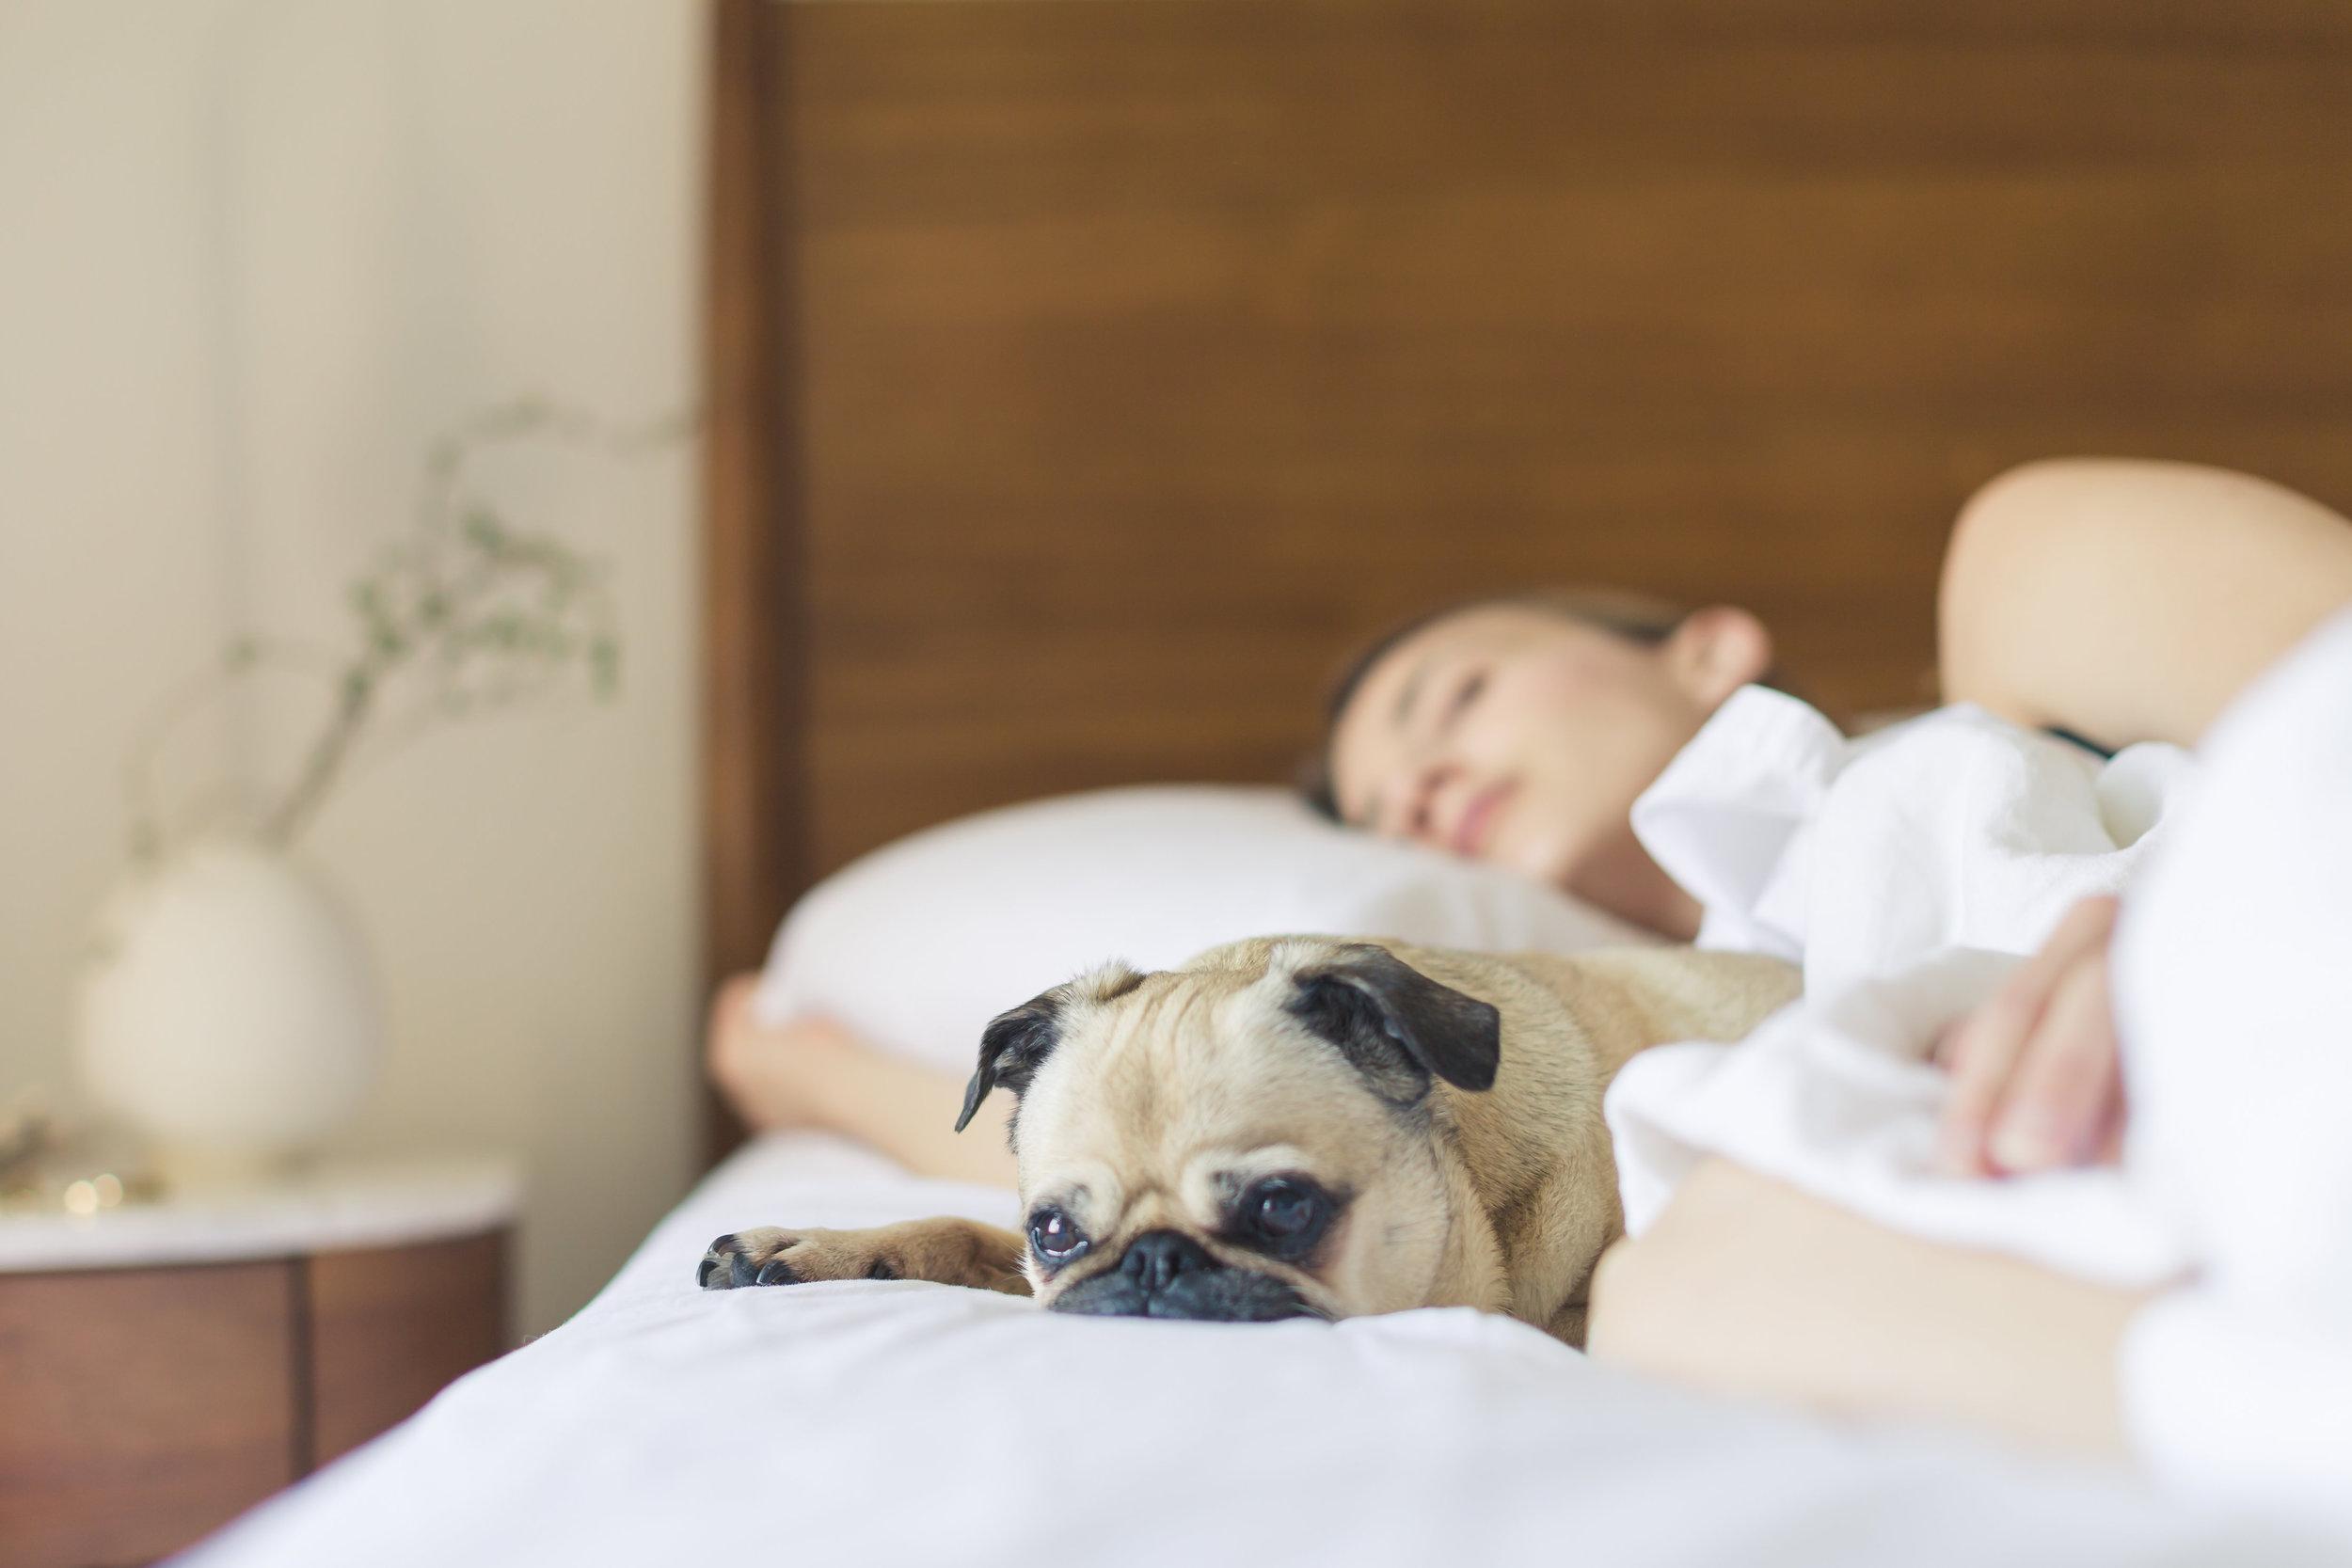 Canva - Pug Sleeping Beside Woman on Bed.jpg